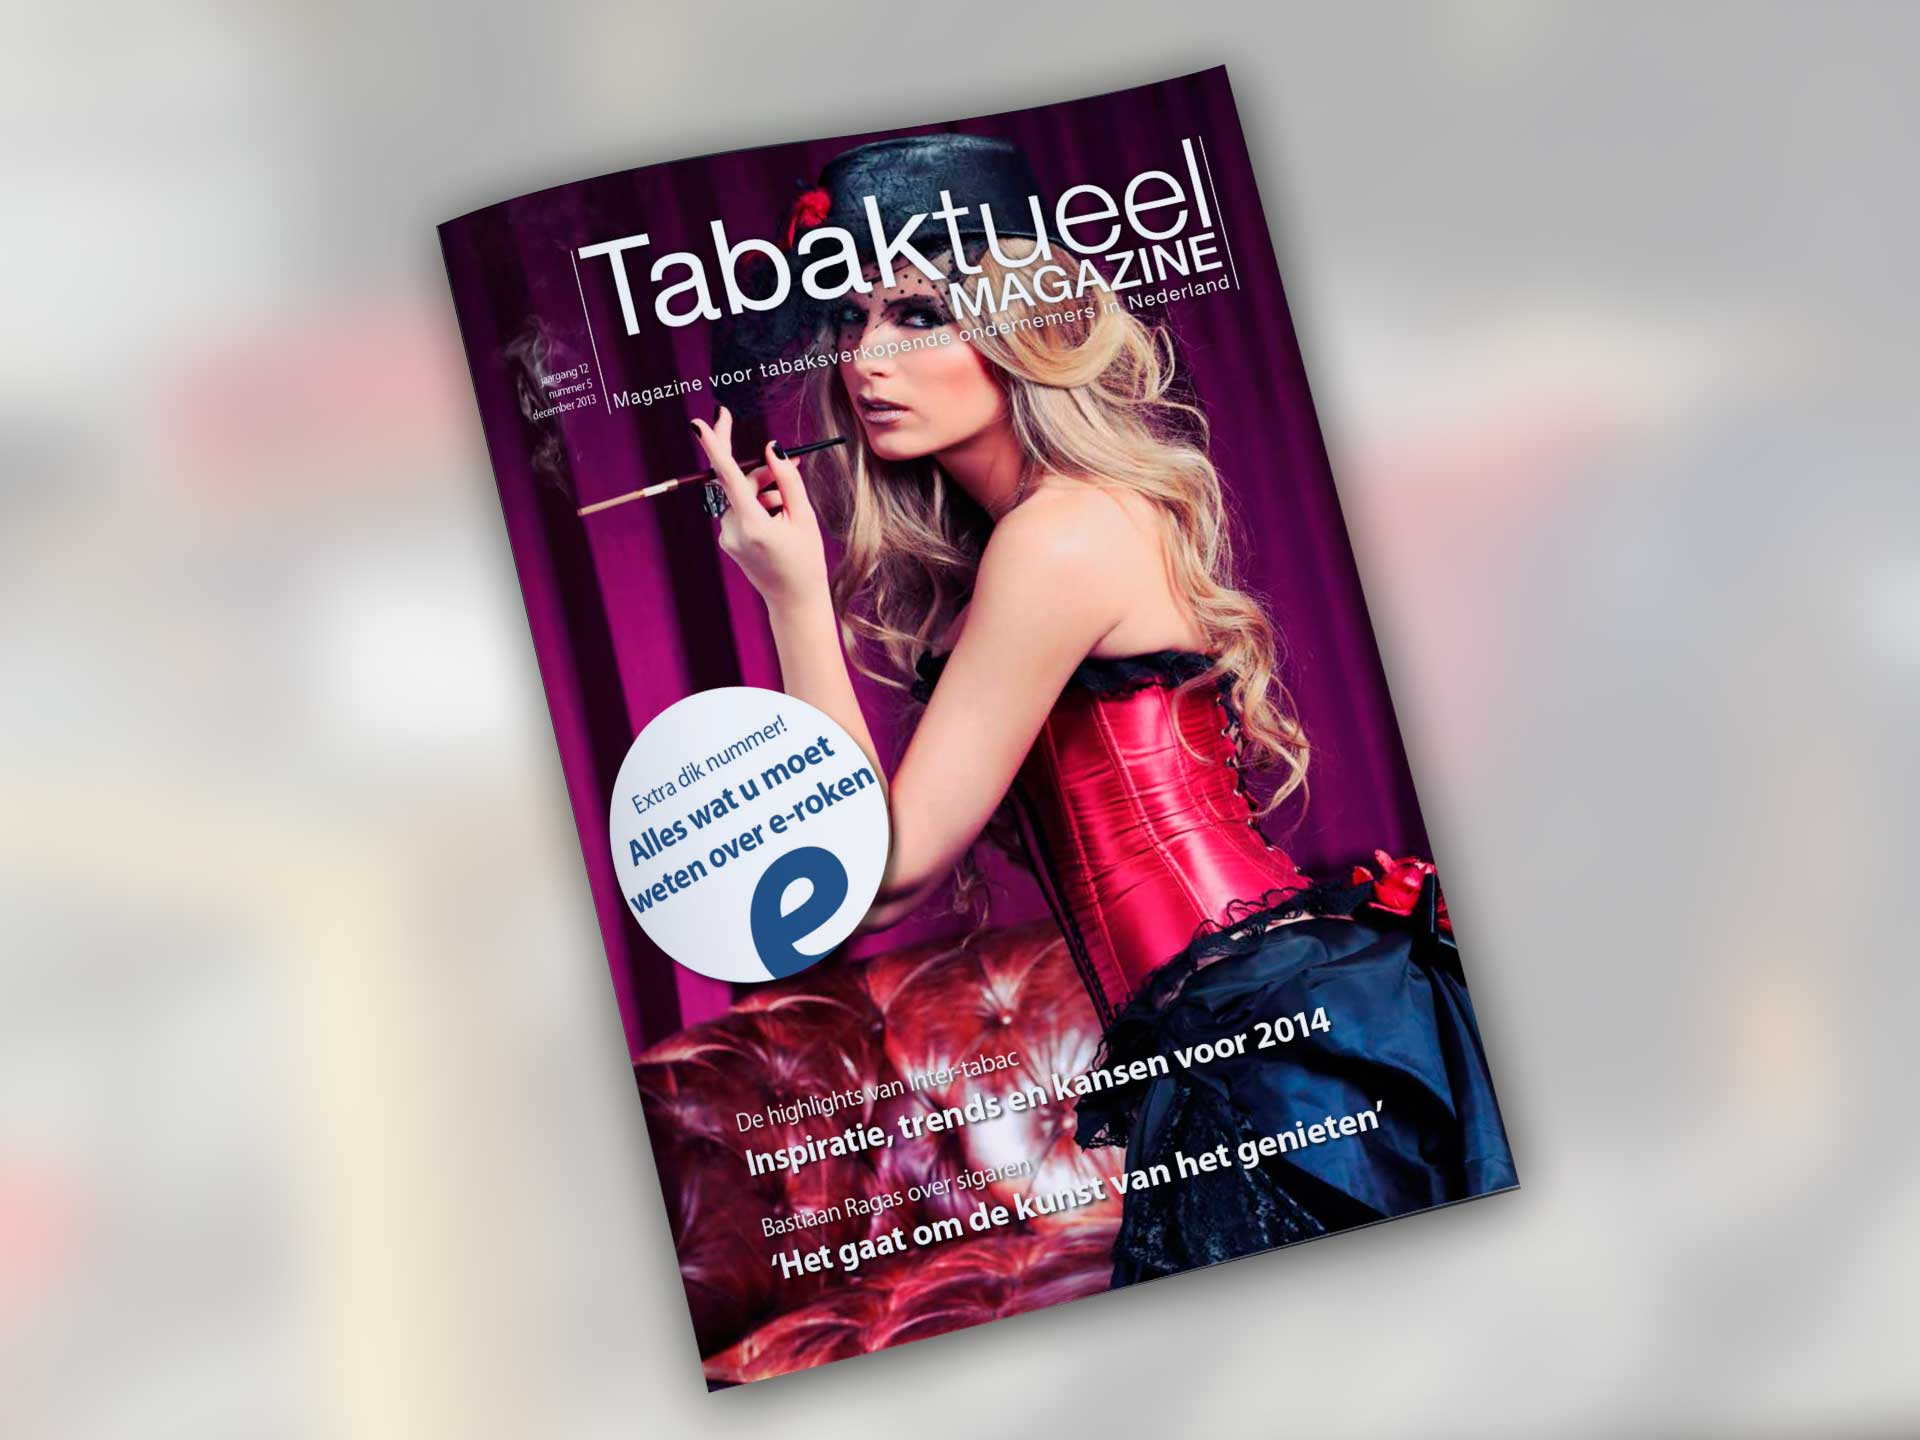 Tabaktueel, magazine